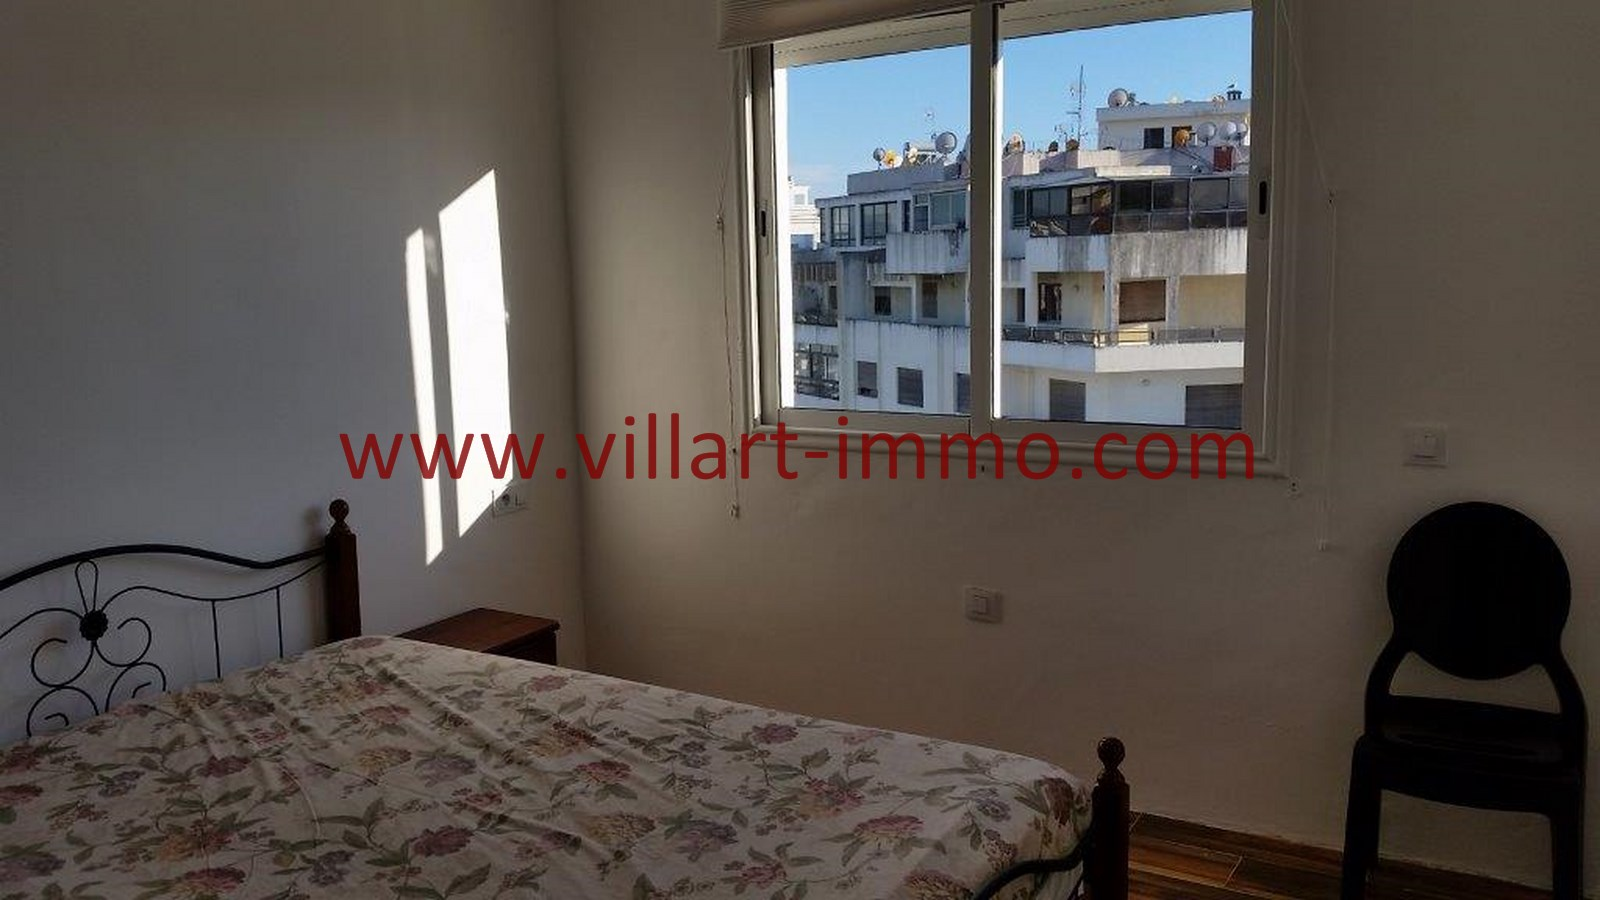 13-Vente-Appartement-Tanger-Centre-De-Ville-Chambre a coucher 4-VA518-Villart Immo